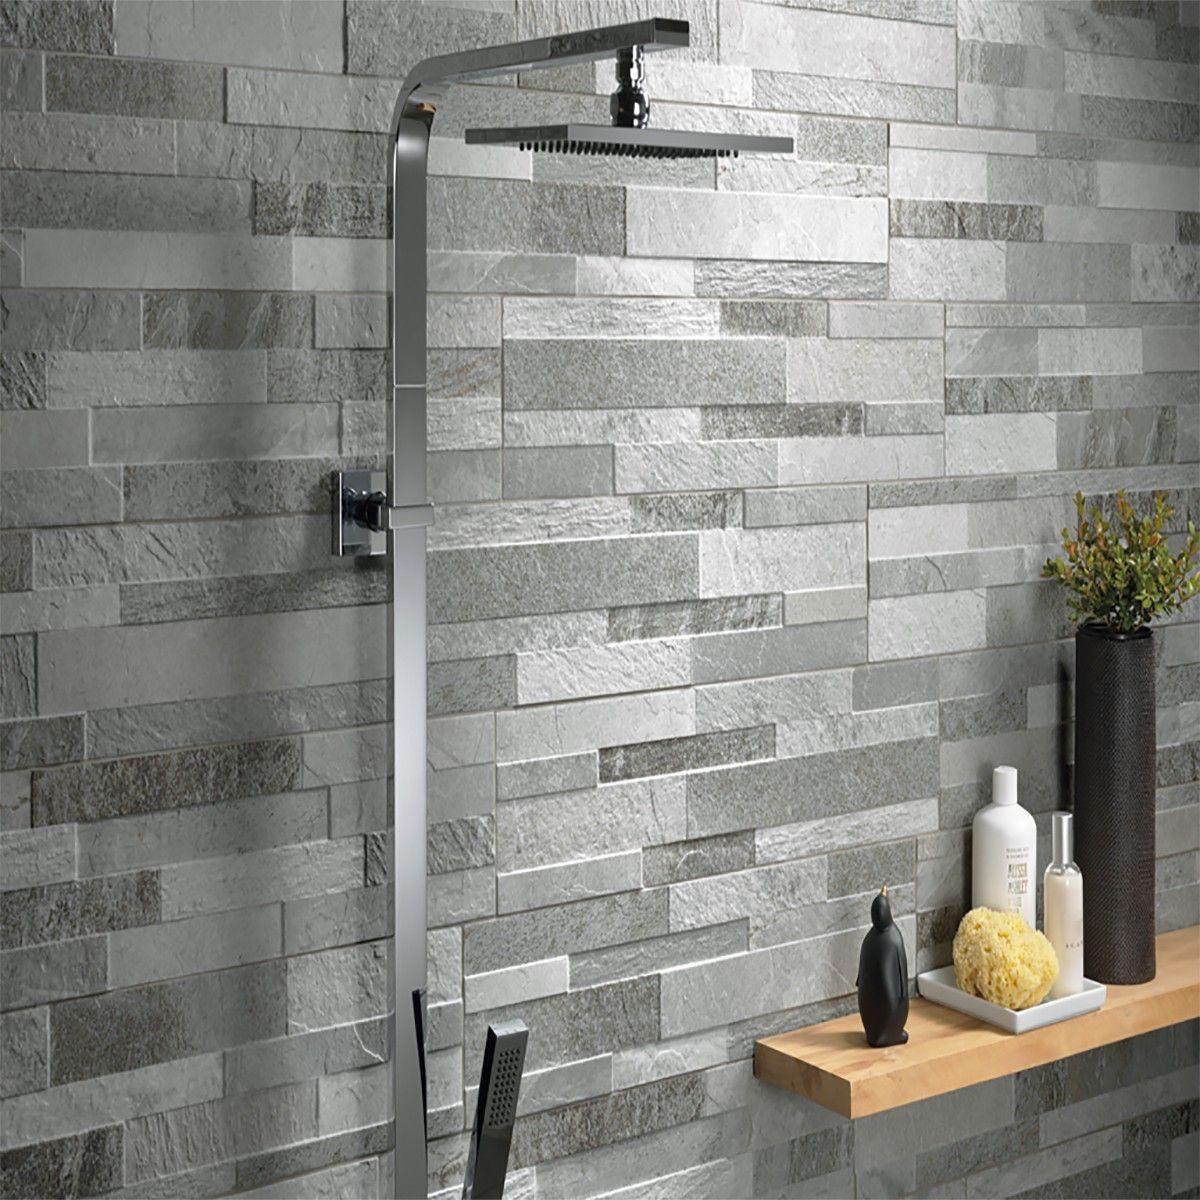 Cubics Grey Porcelain Wall Tiles Grey Wall Tiles Porcelain Wall Tile Bathroom Wall Tile